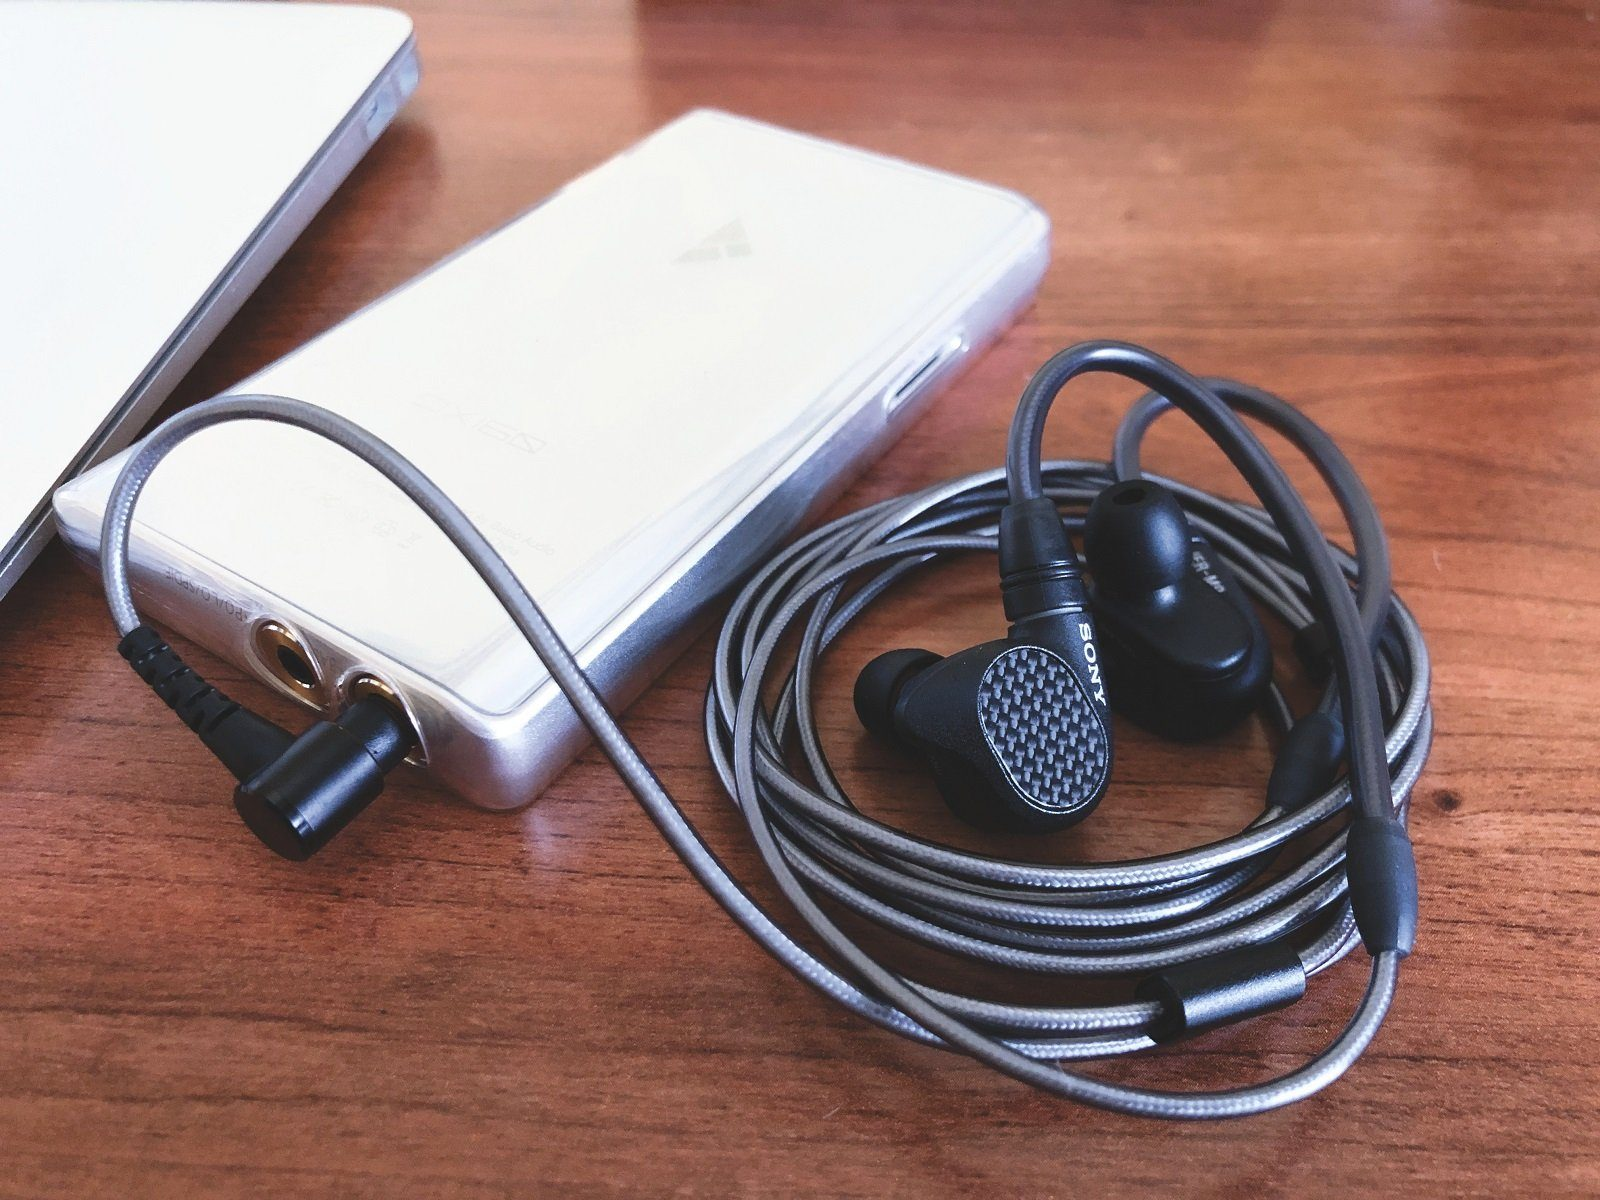 Sony IER-M9 Review - The Kilobuck Benchmark